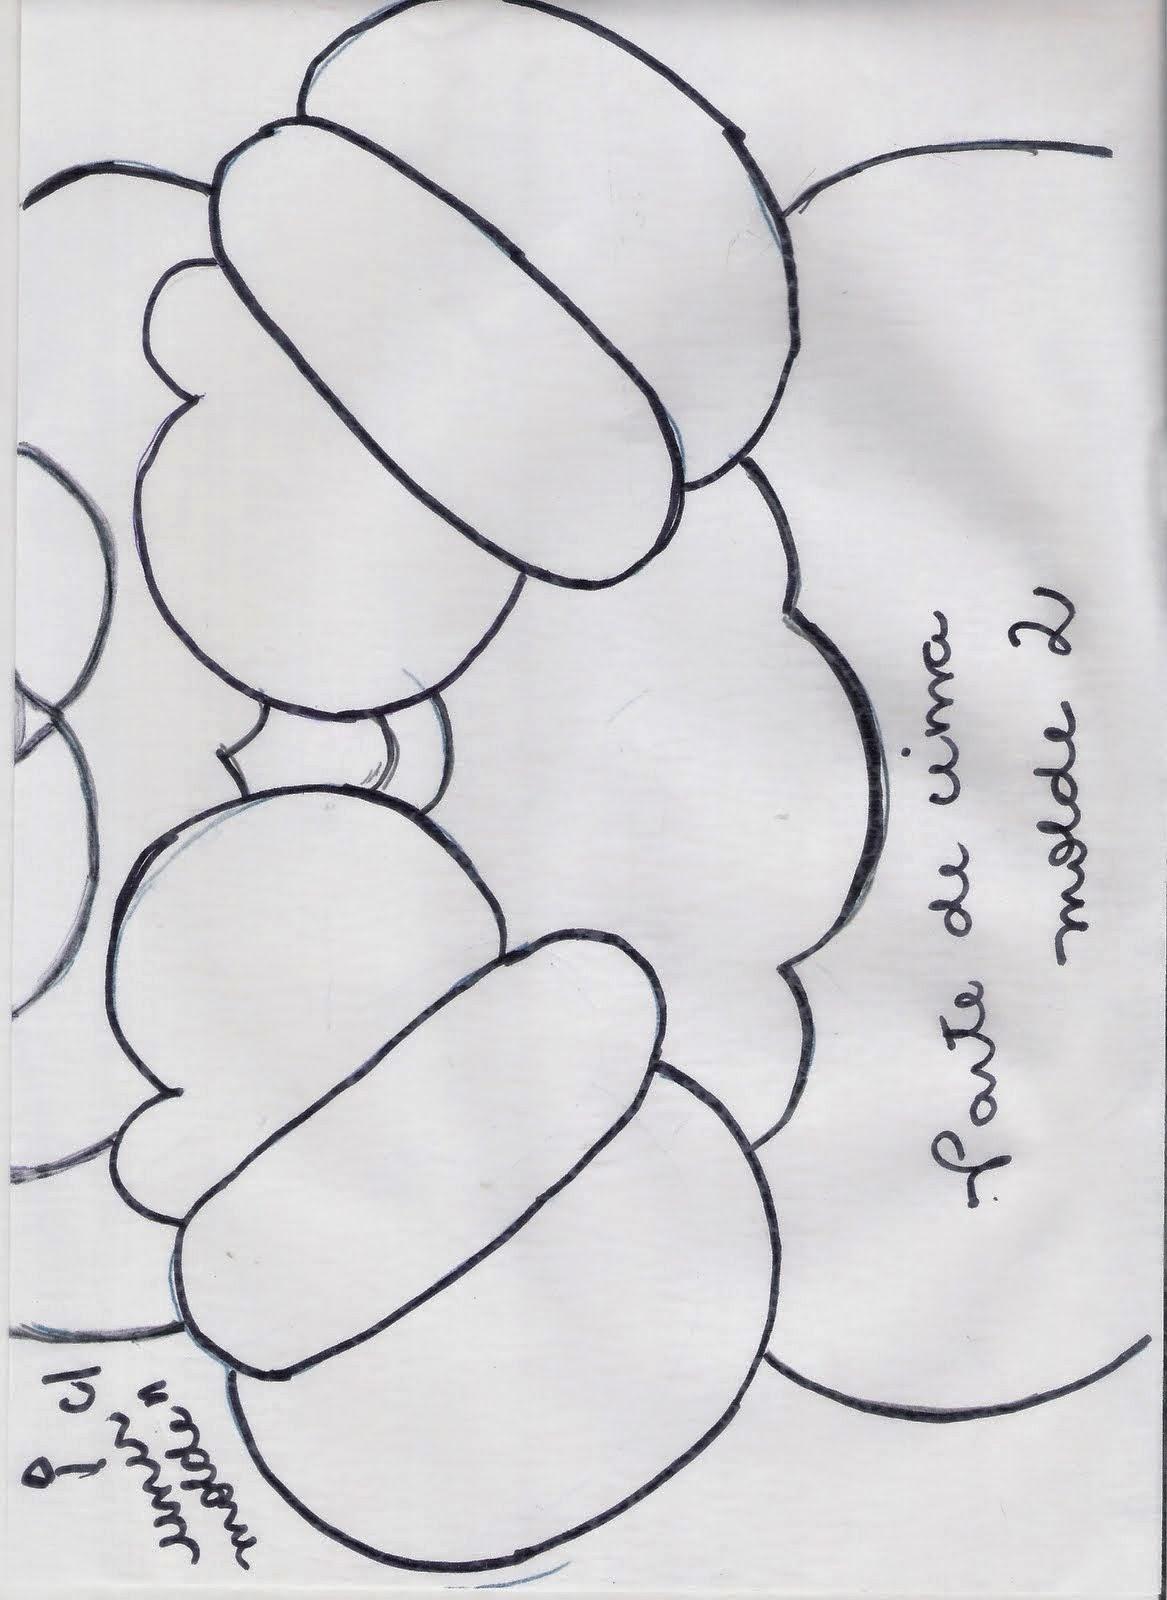 Moldes capa de natal para vaso sanitário